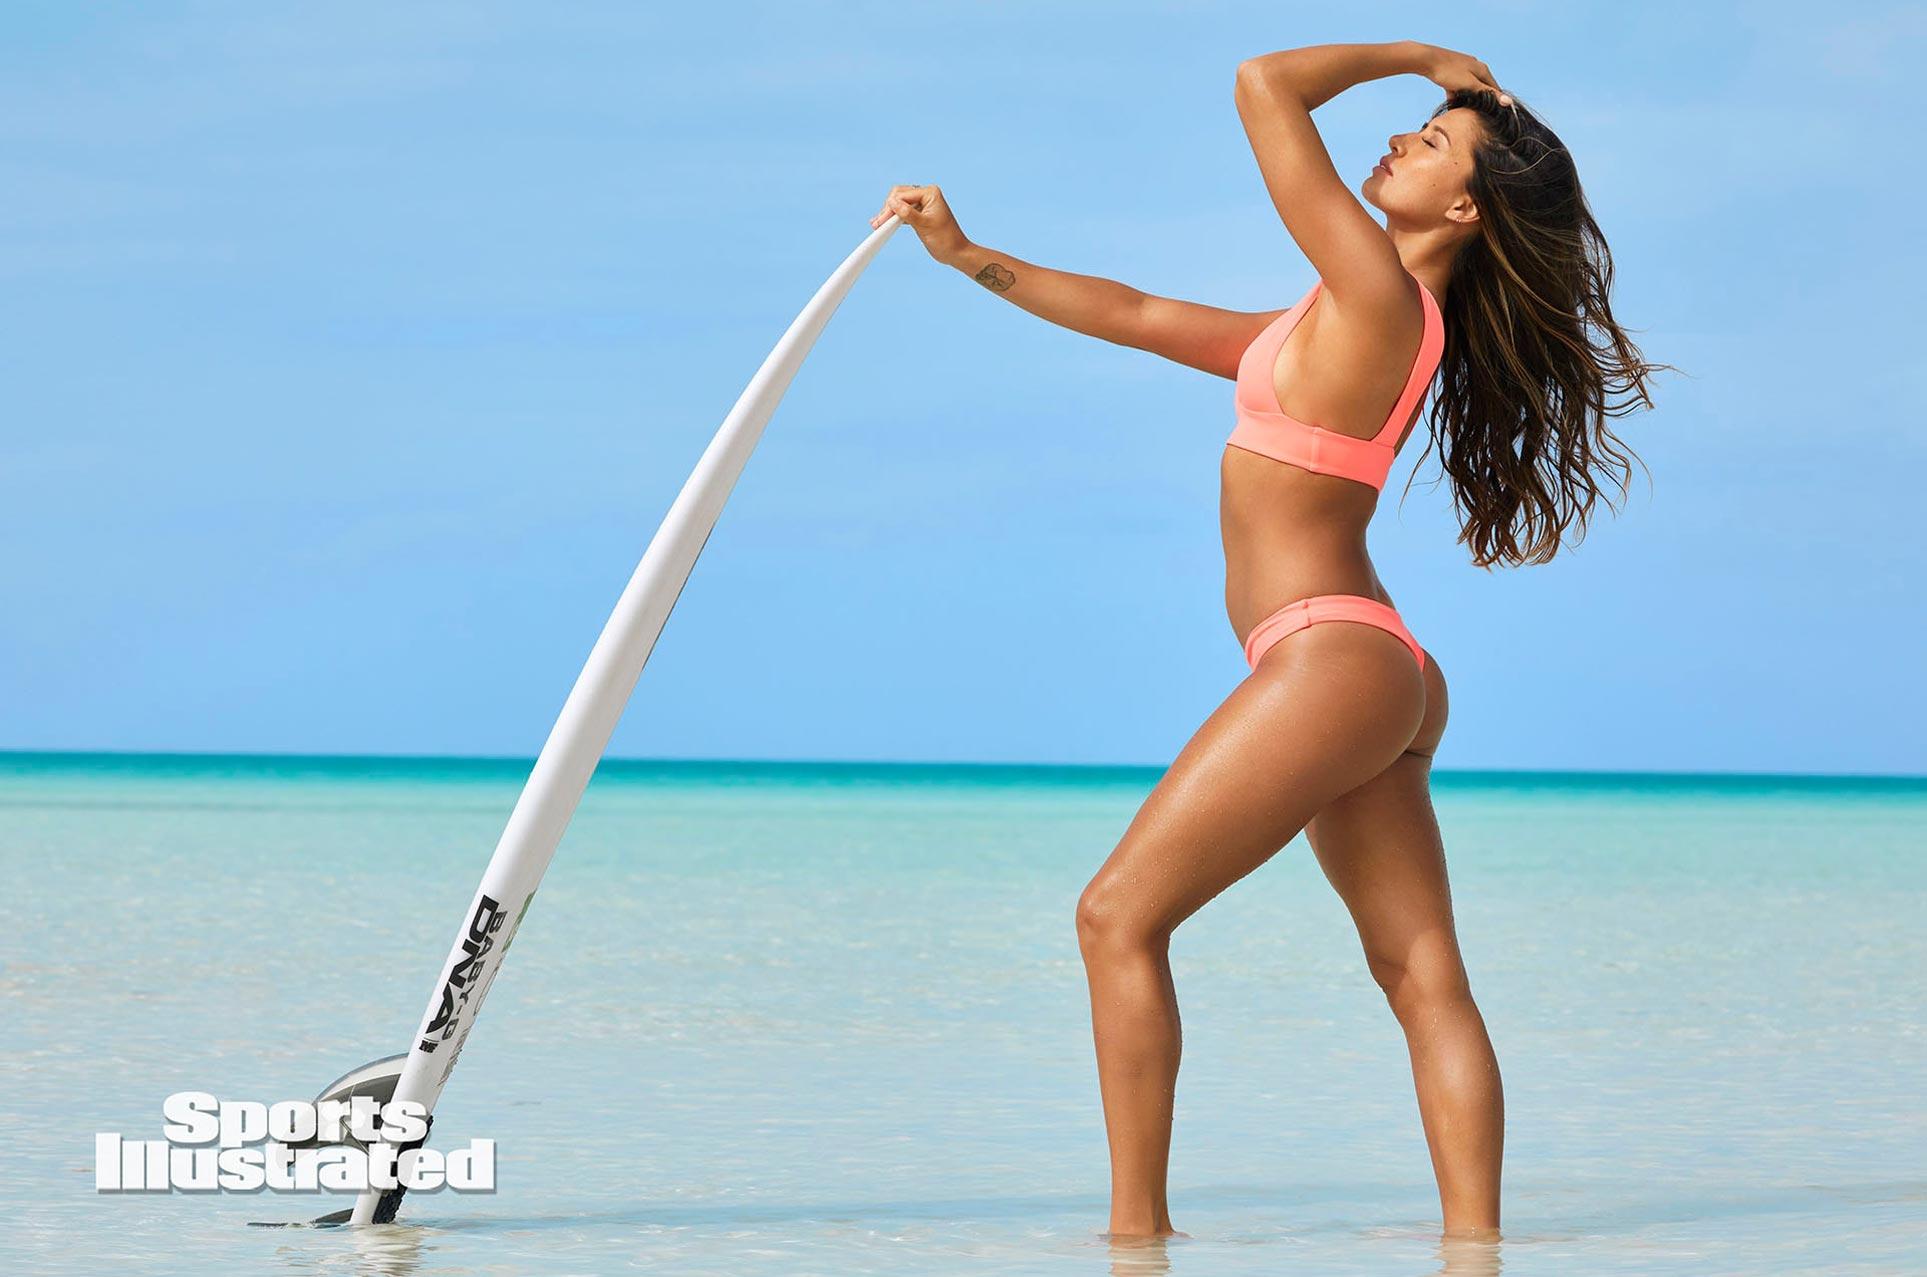 Малия Мануэль в каталоге купальников Sports Illustrated Swimsuit 2020 / фото 16